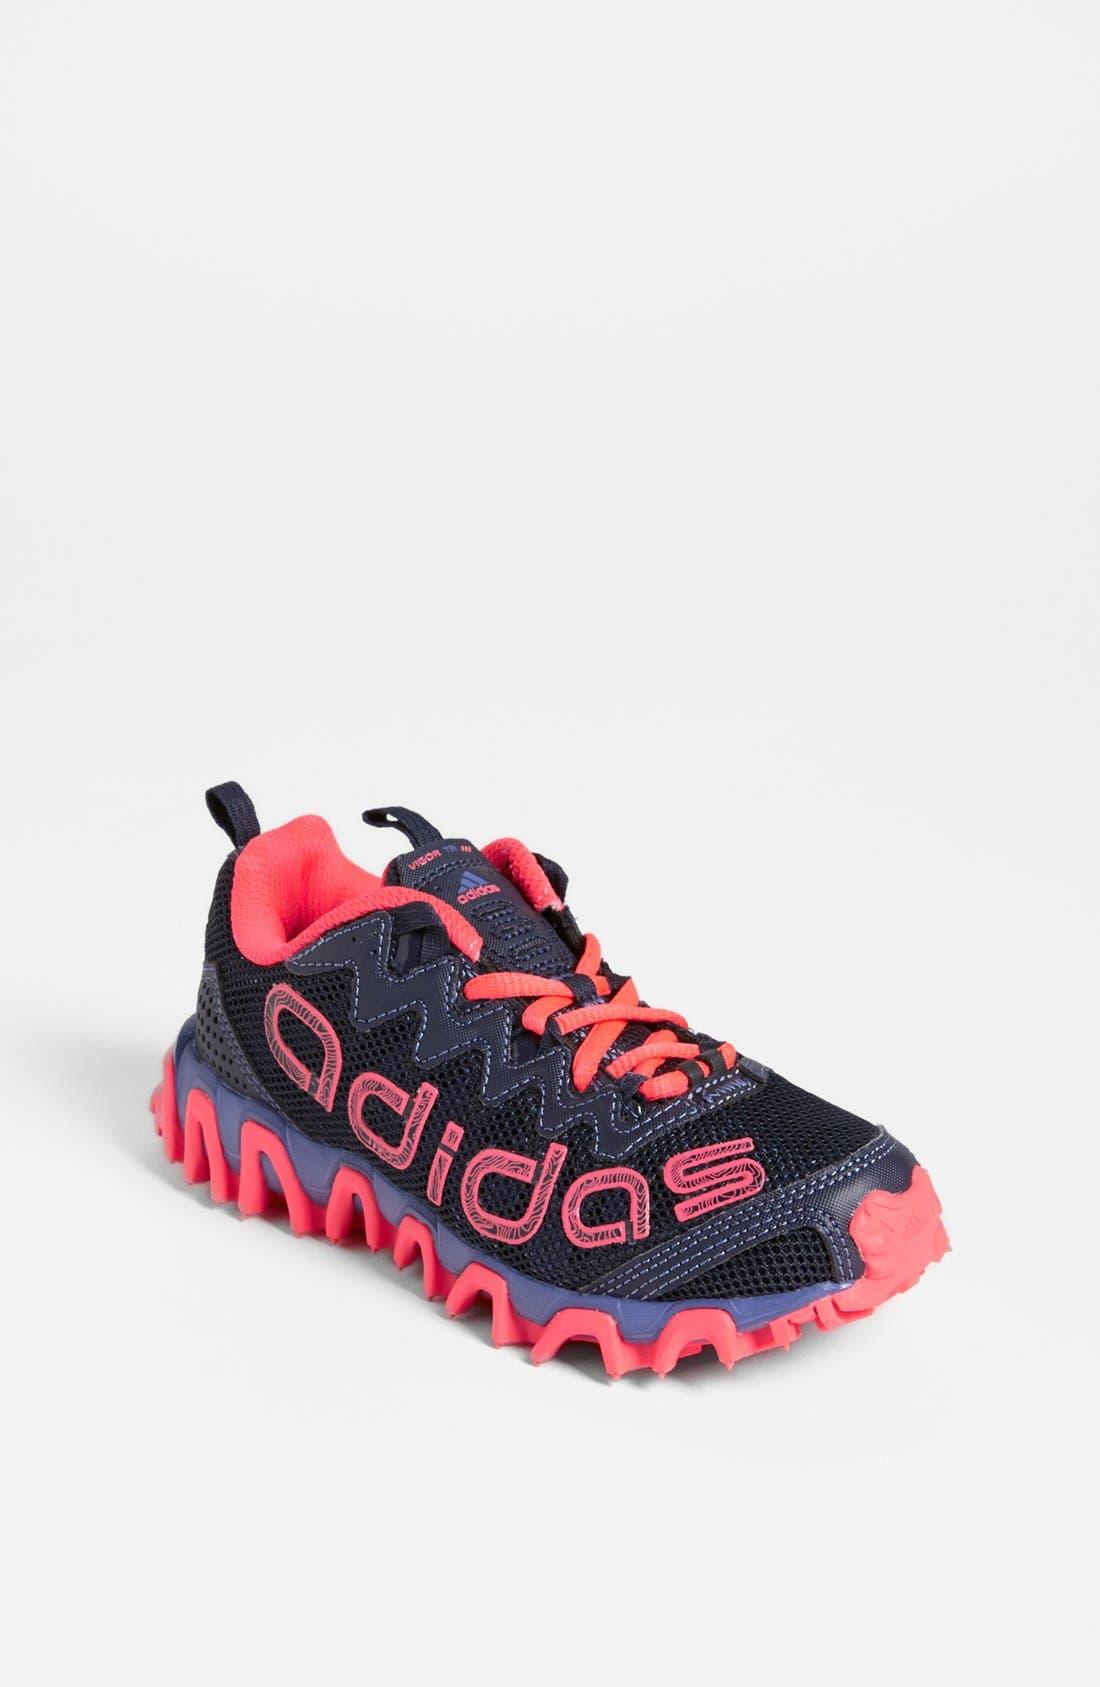 Alternate Image 1 Selected - adidas 'Vigor Trail 2' Running Shoe (Toddler, Little Kid & Big Kid)